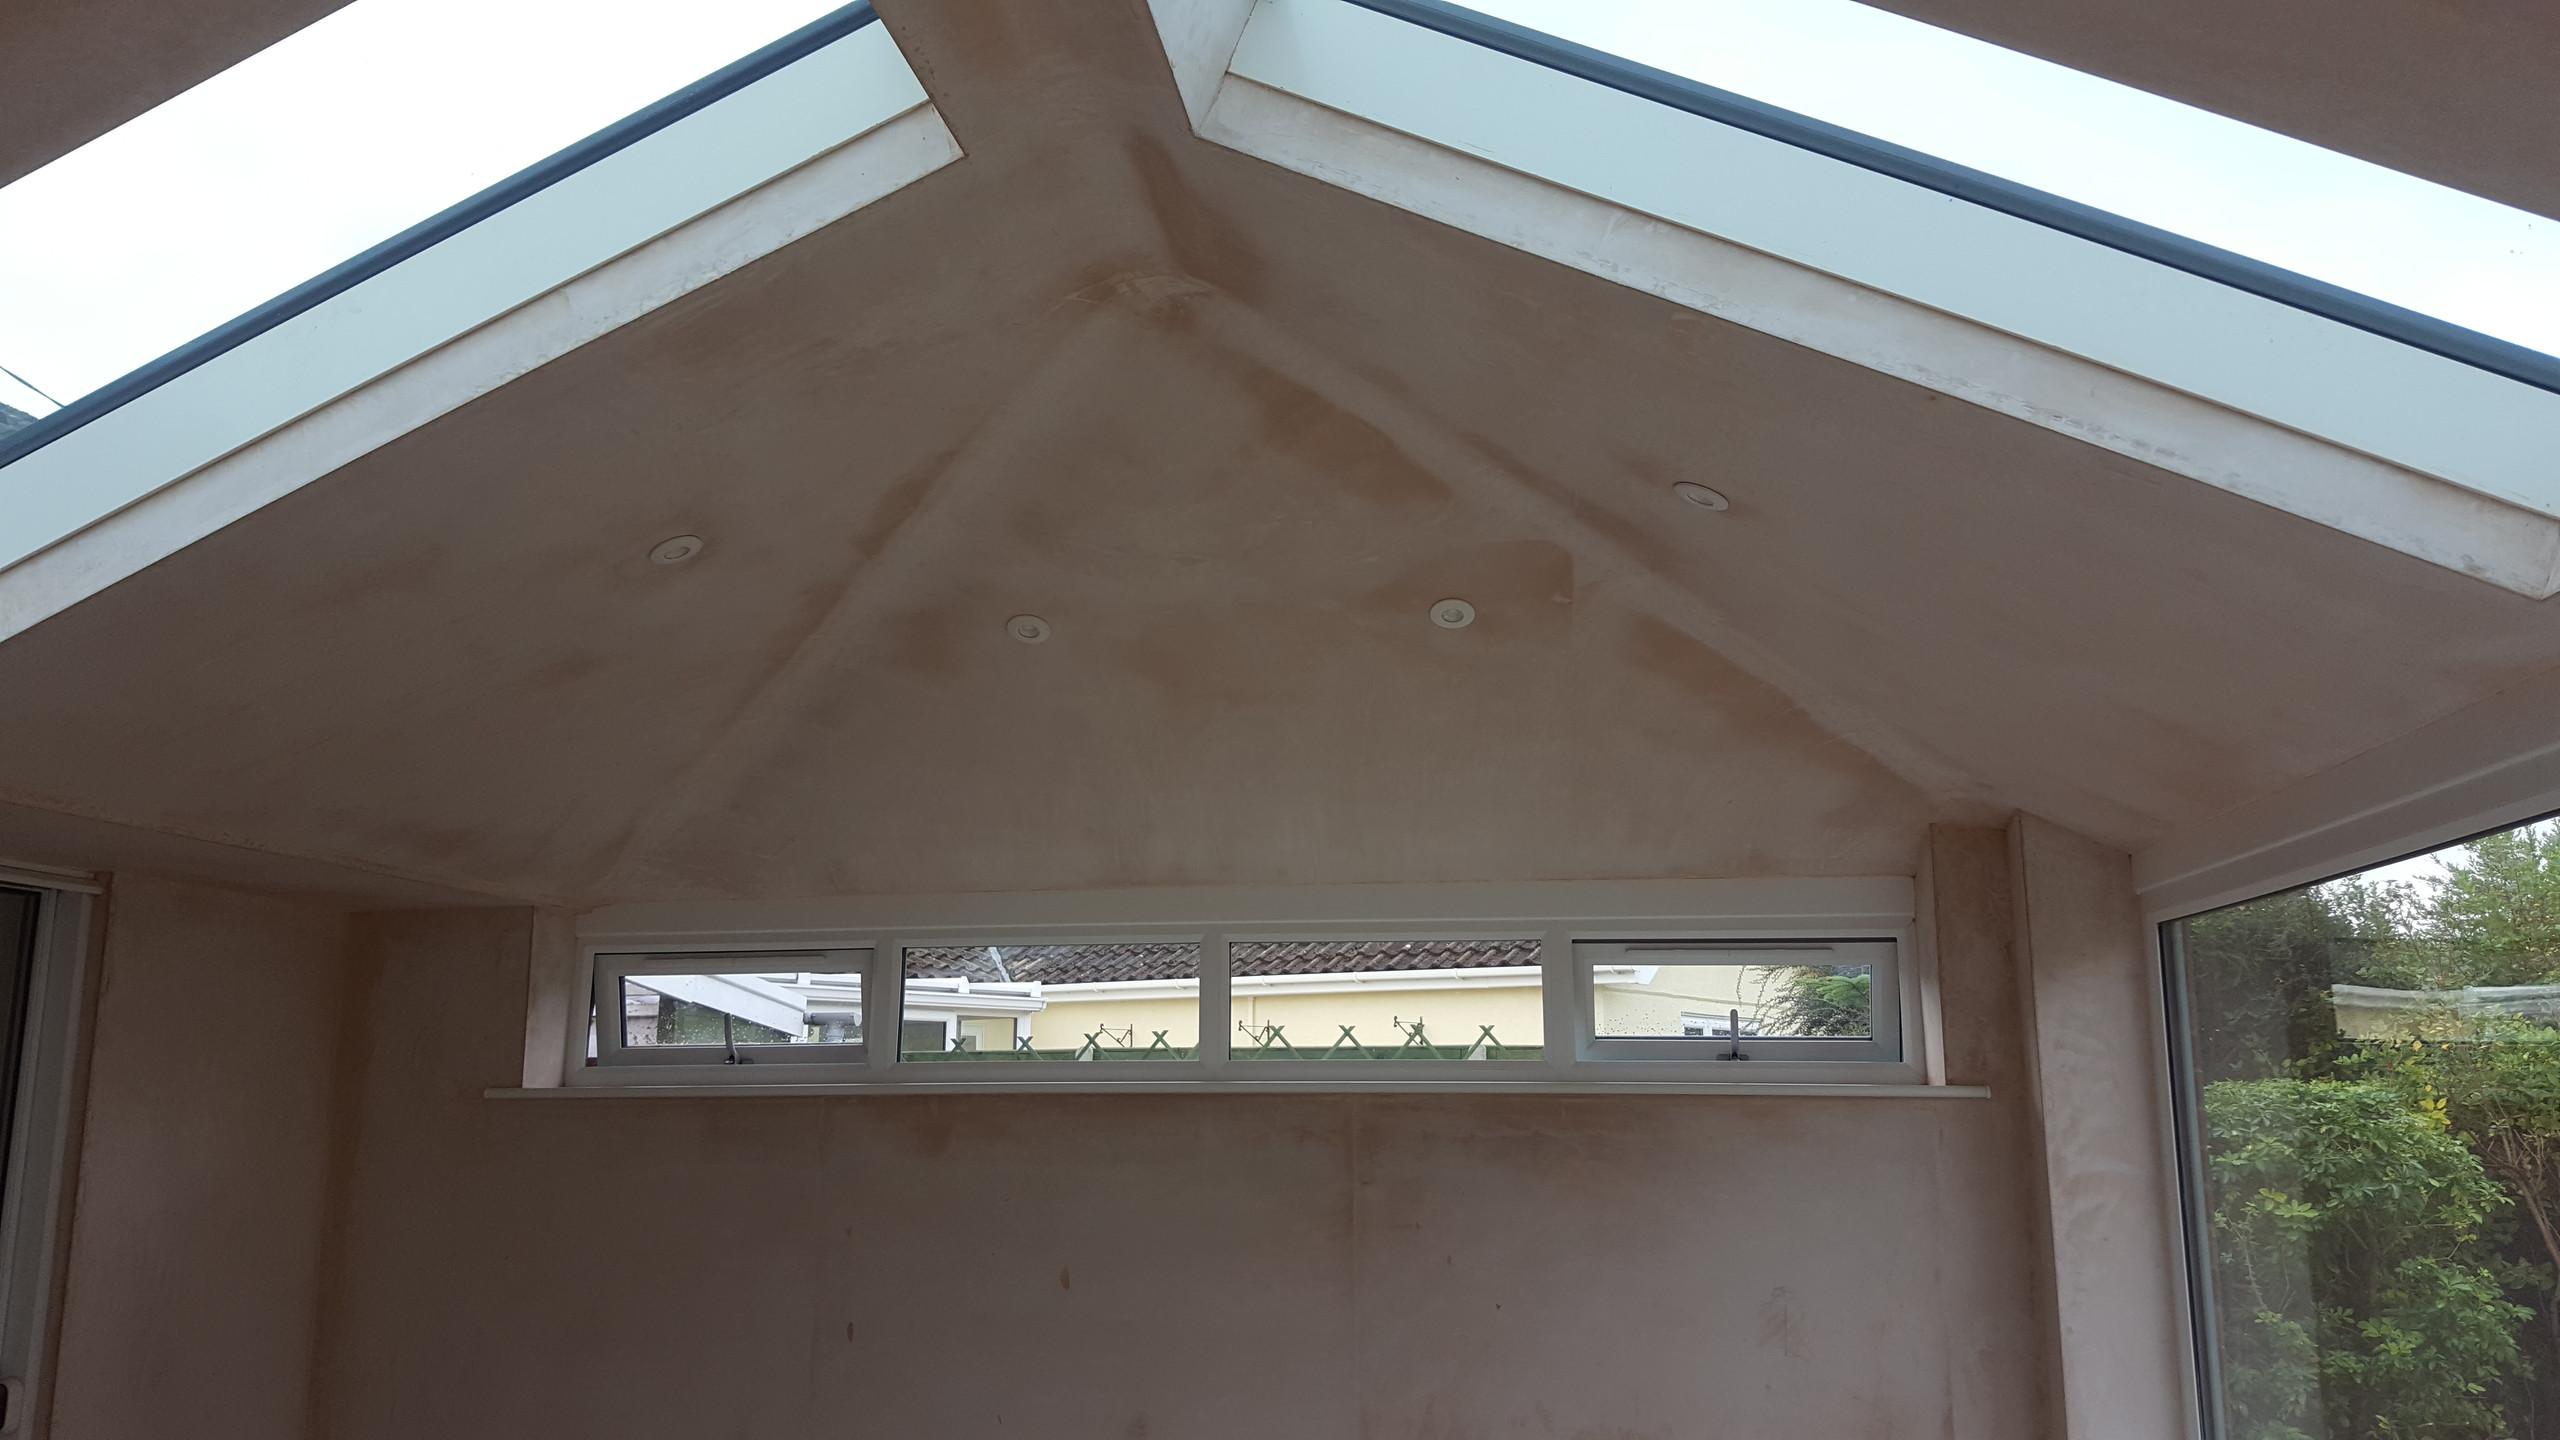 Roof Lights installed